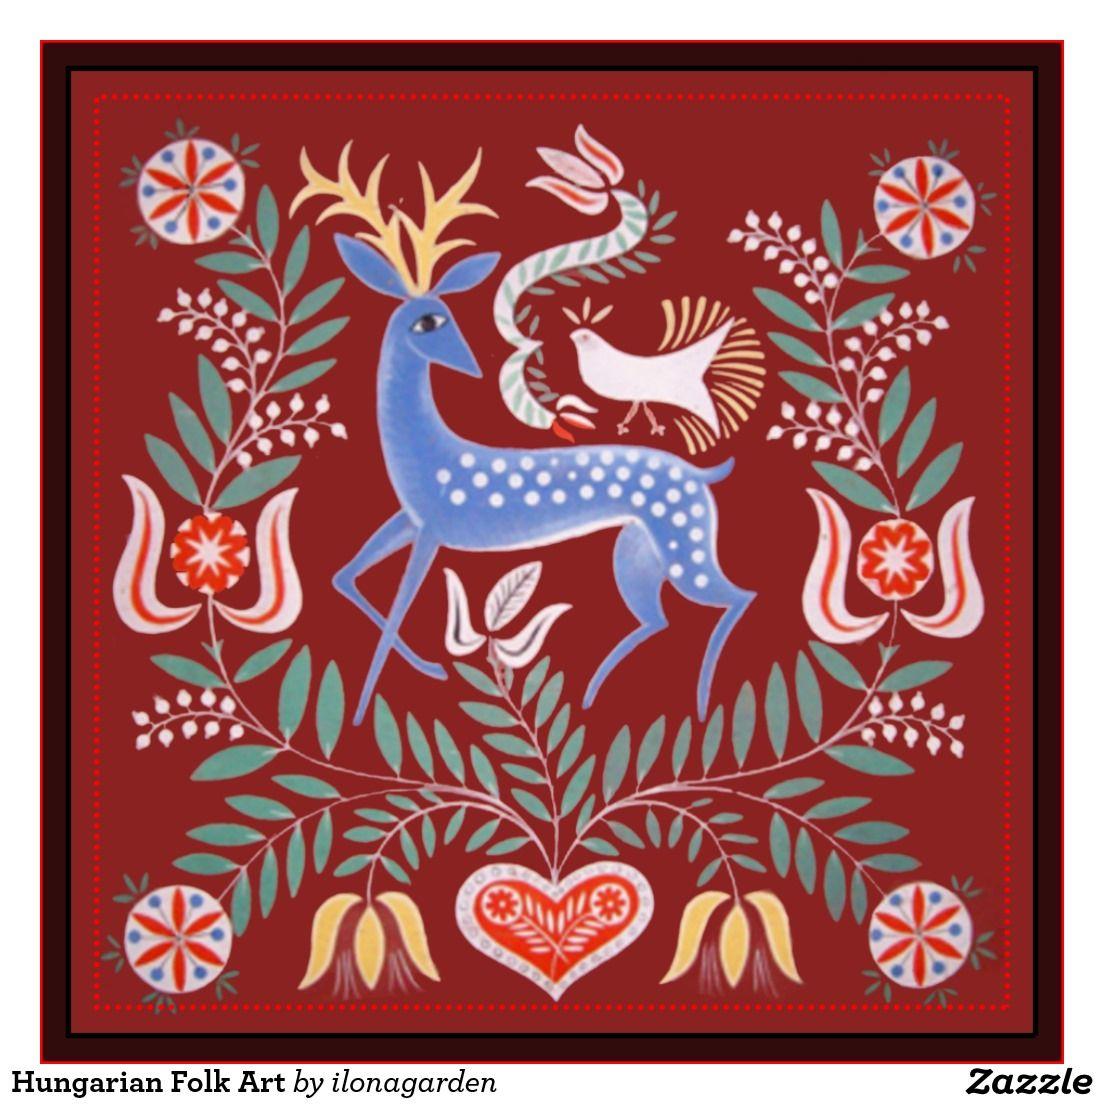 eastern european folk art - Google Search | pintura decorativa ...